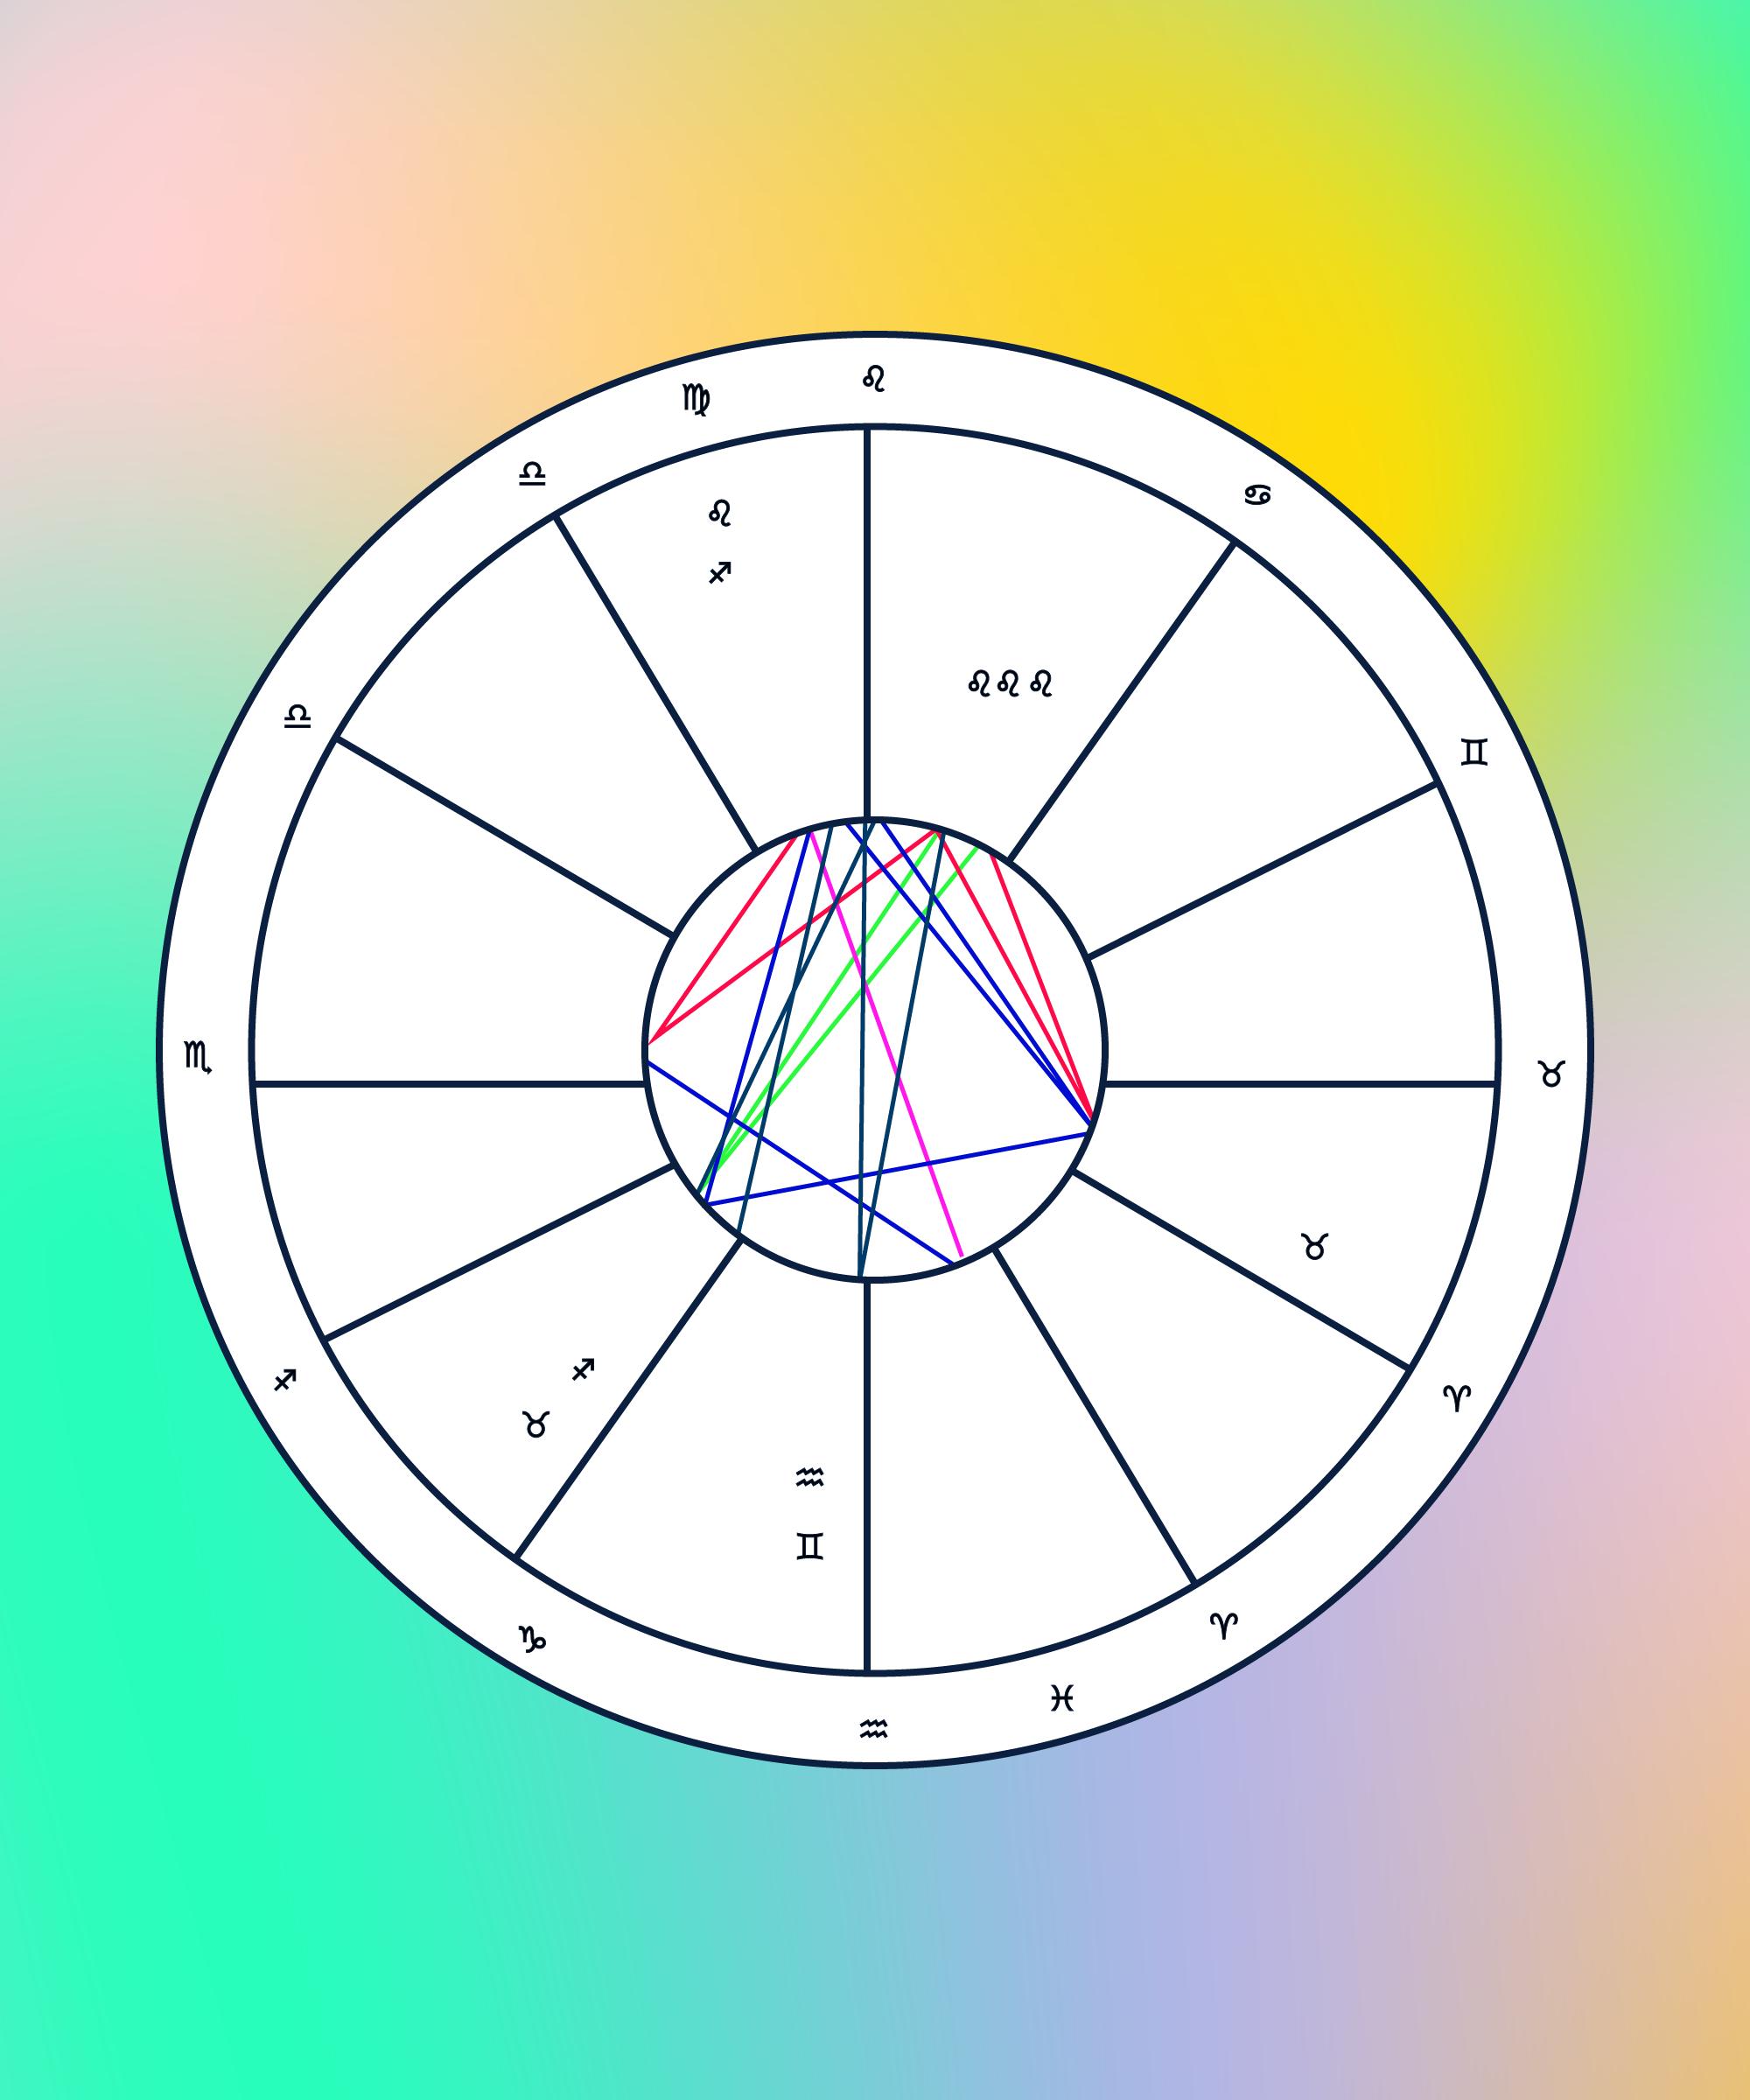 Mars in taurus woman astrology for your life pinterest taurus birth chart analysis and taurus woman